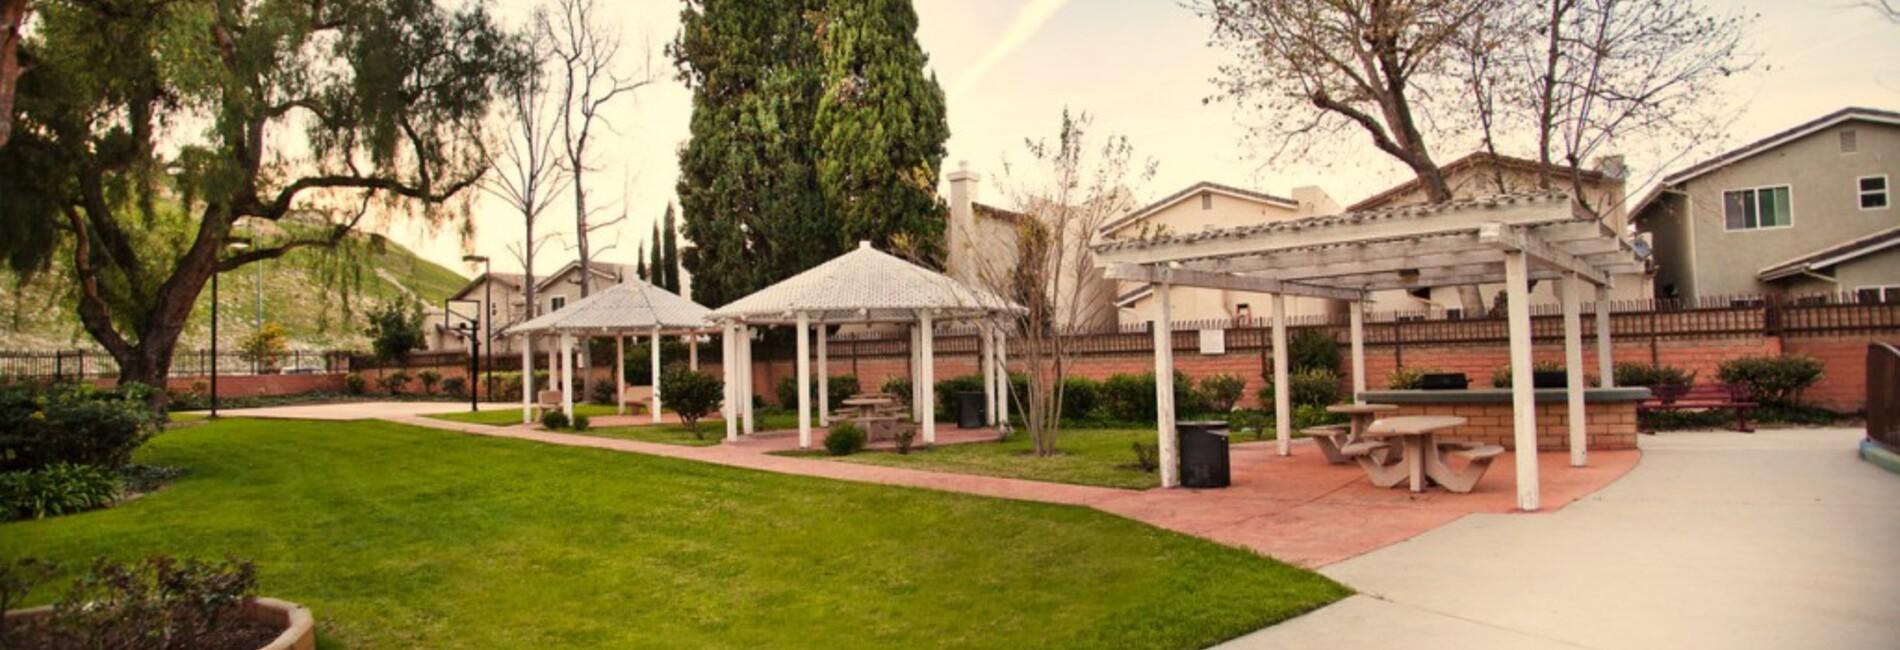 Villa topanga apartments in san fernando valley - 3 bedroom apartments san fernando valley ...